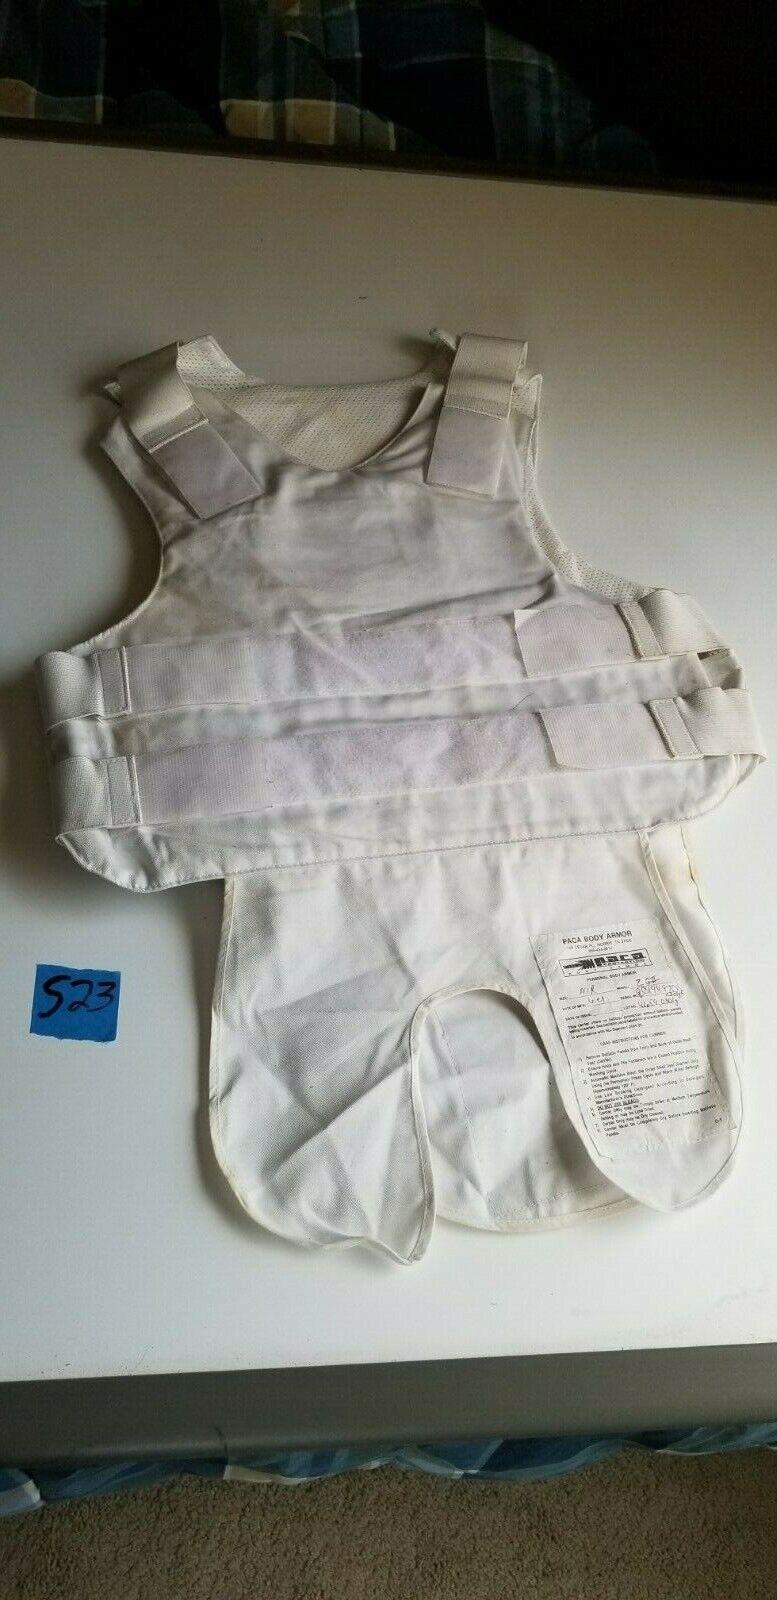 Tactical PACA Body Armor Vest ZGII Level II  Level 2 Soft Body Armor + Garment  gorgeous